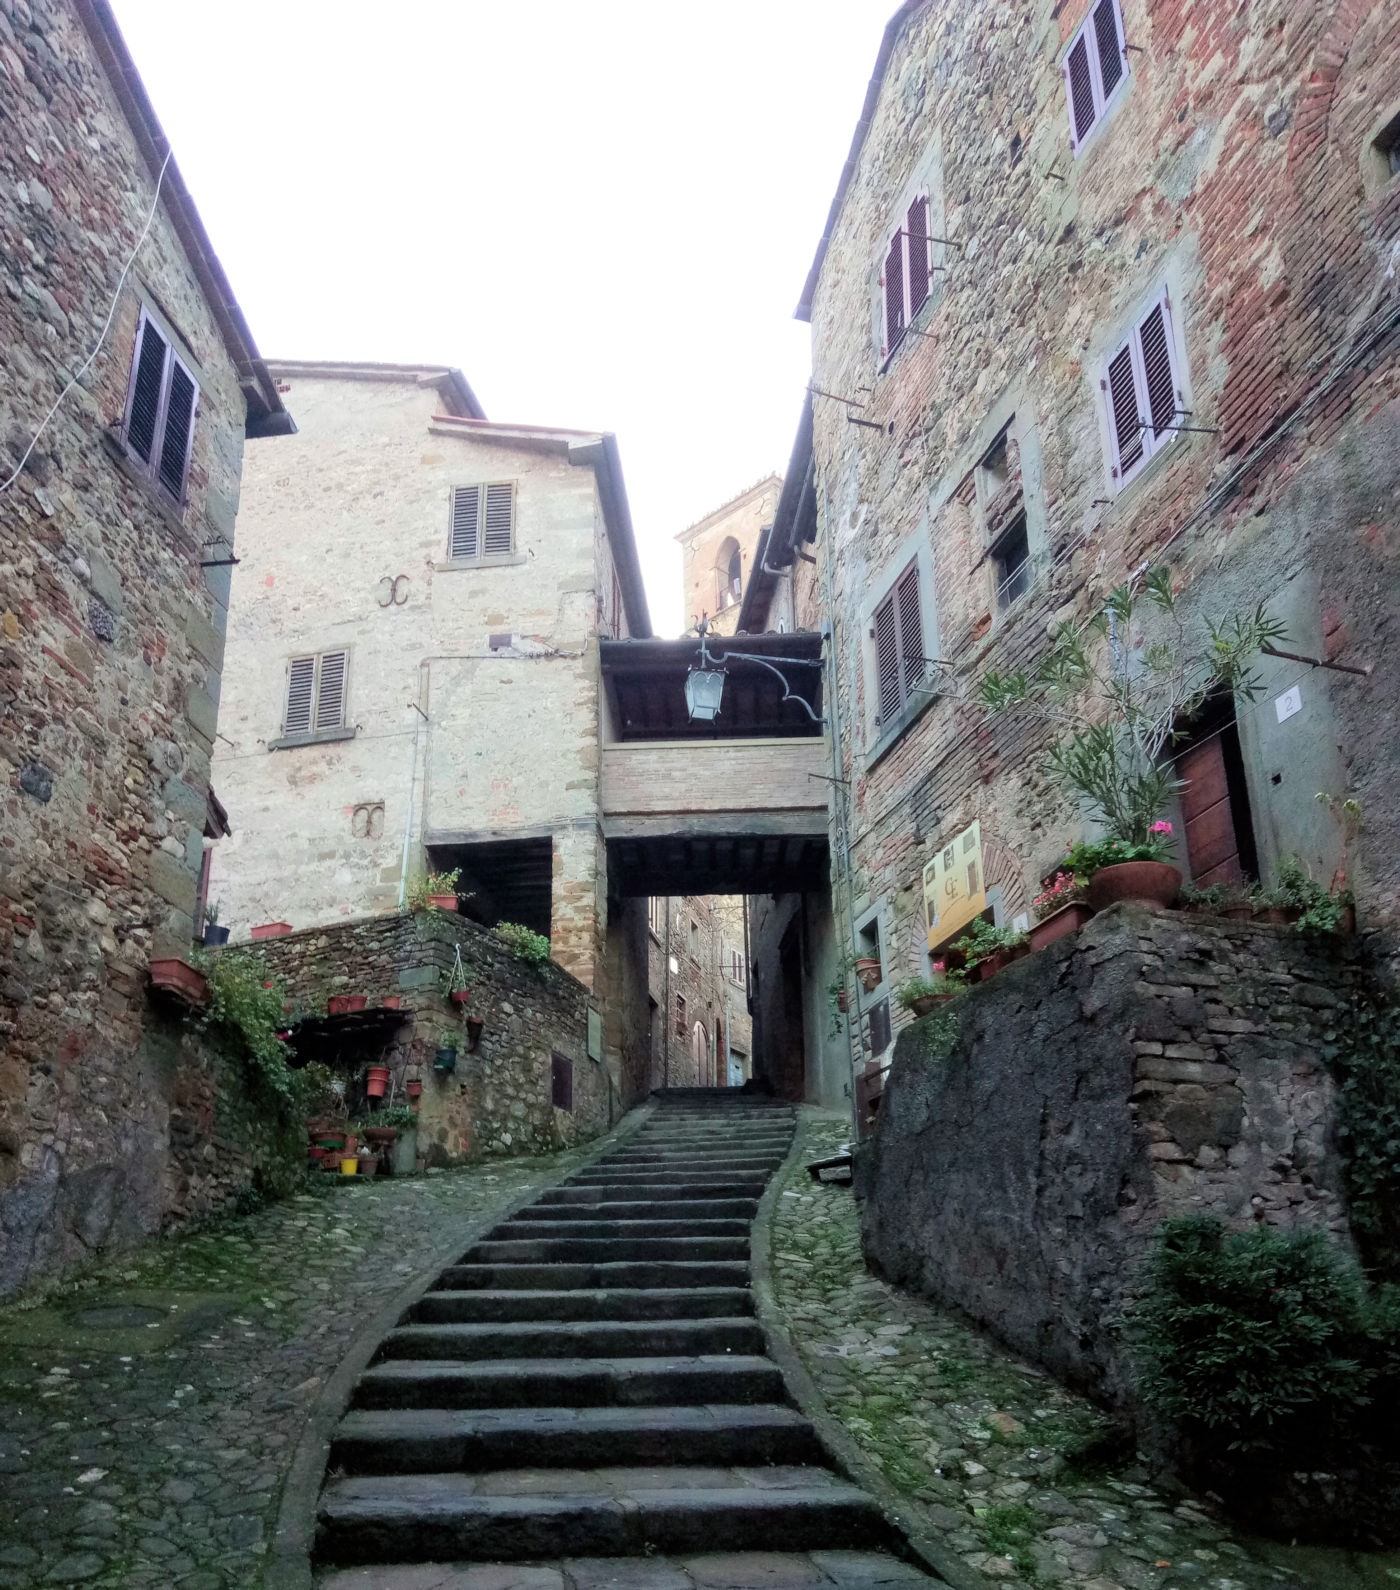 Toscana tra terme e borghi in caravan o camper - Anghiari